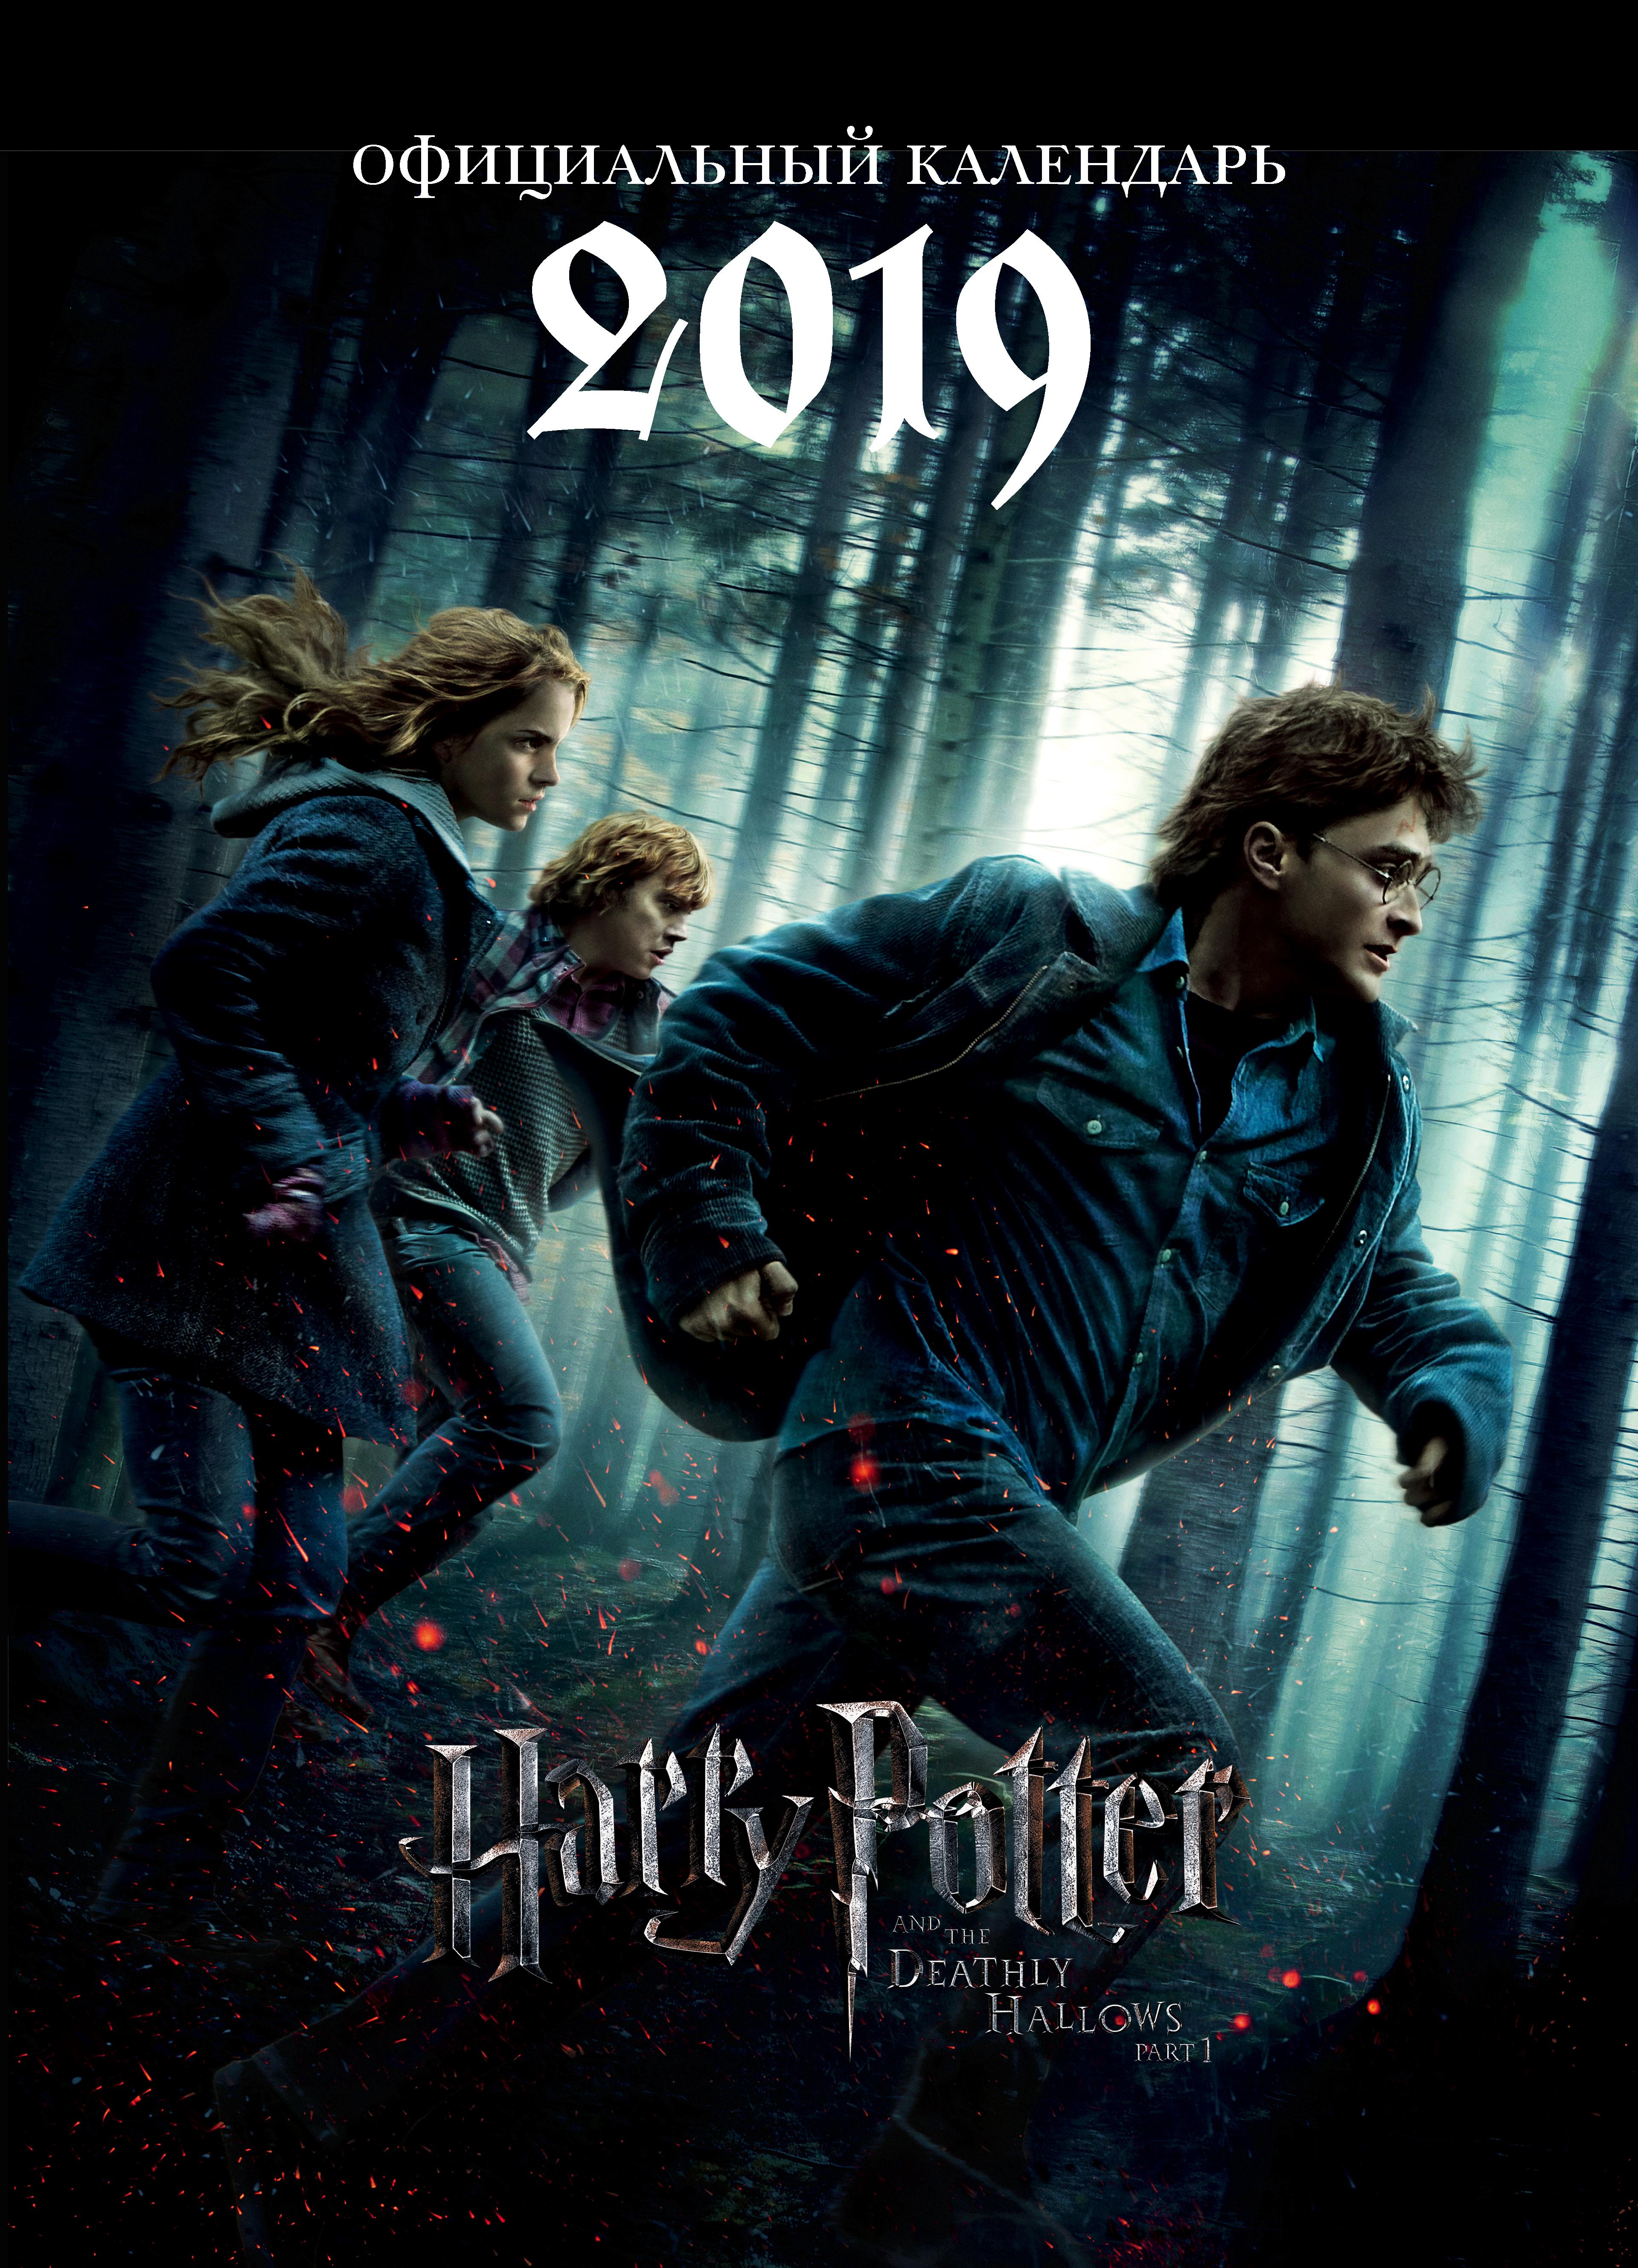 Гарри Поттер. Календарь настенный на 2019 год. Постер ISBN: 978-5-04-095260-1